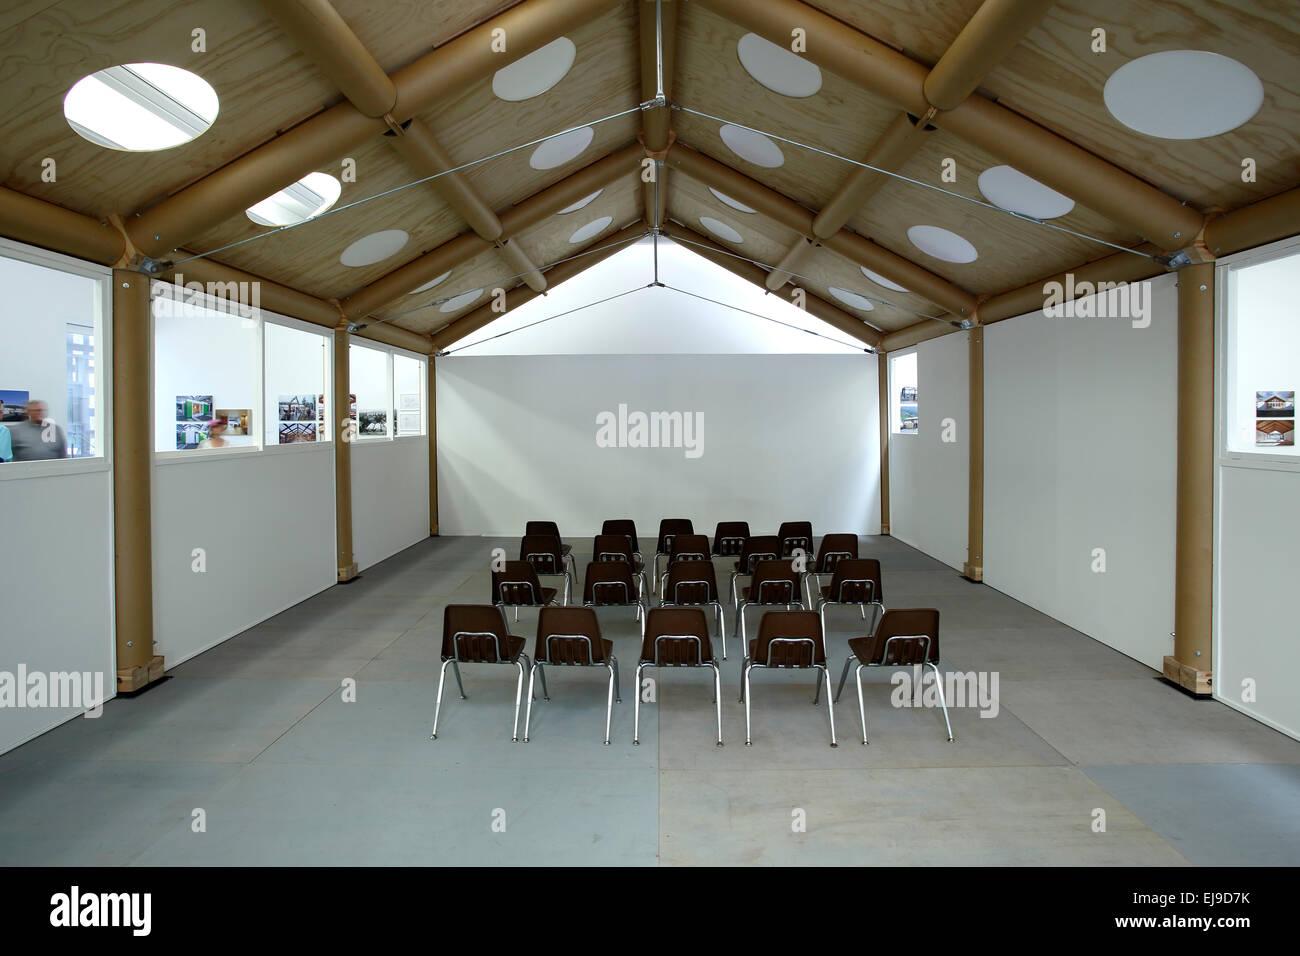 Humanitarian architecture exhibit (designed by Shigeru Ban), Aspen Art Museum (by architect Shigeru Ban), Aspen, - Stock Image